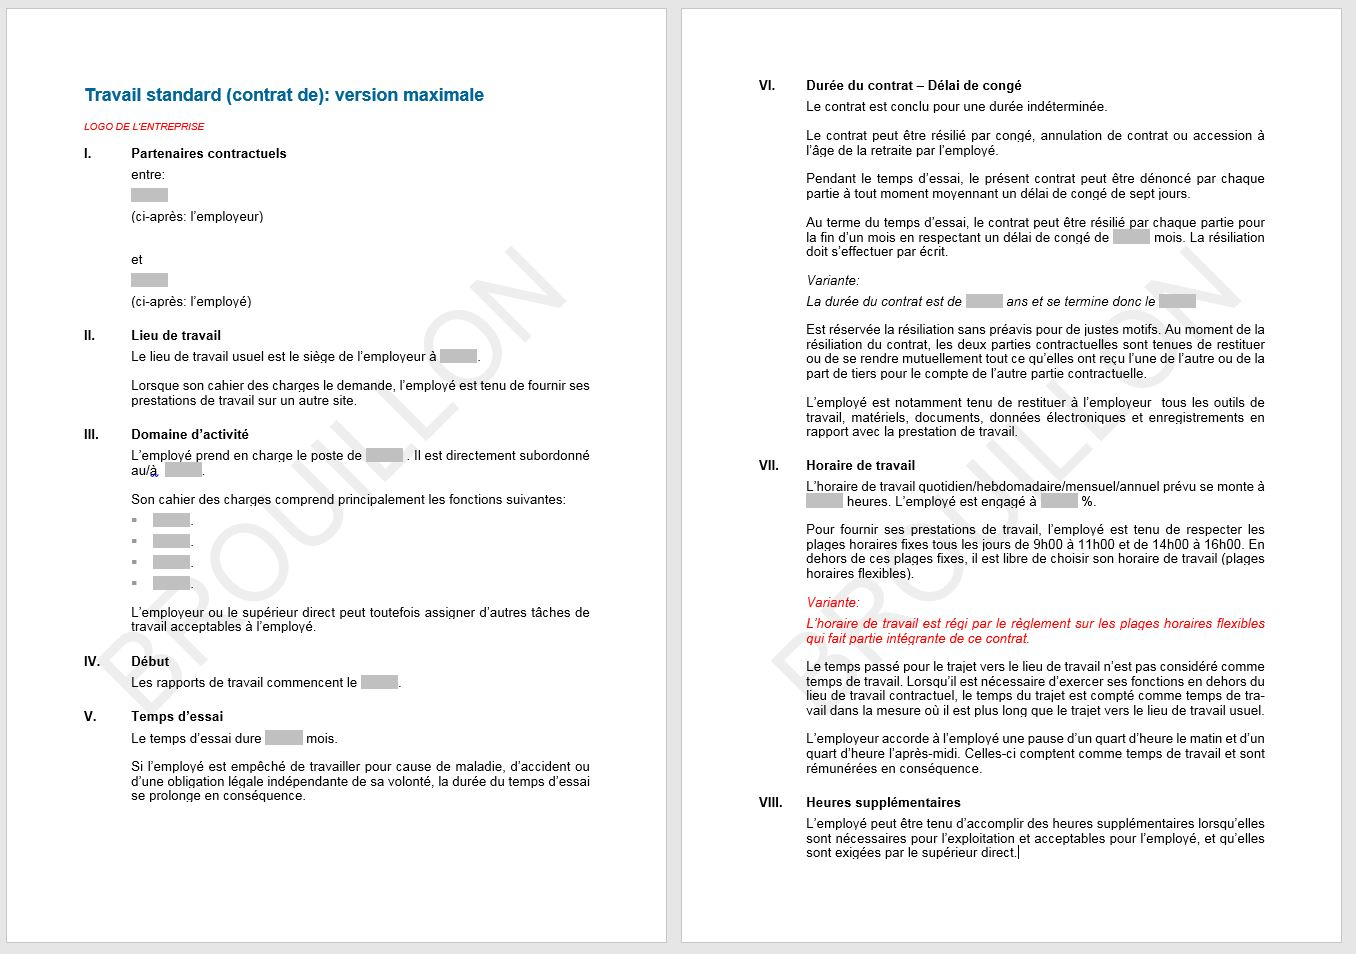 contrat de travail standard Download Contrat de travail standard | AGVS | UPSA contrat de travail standard